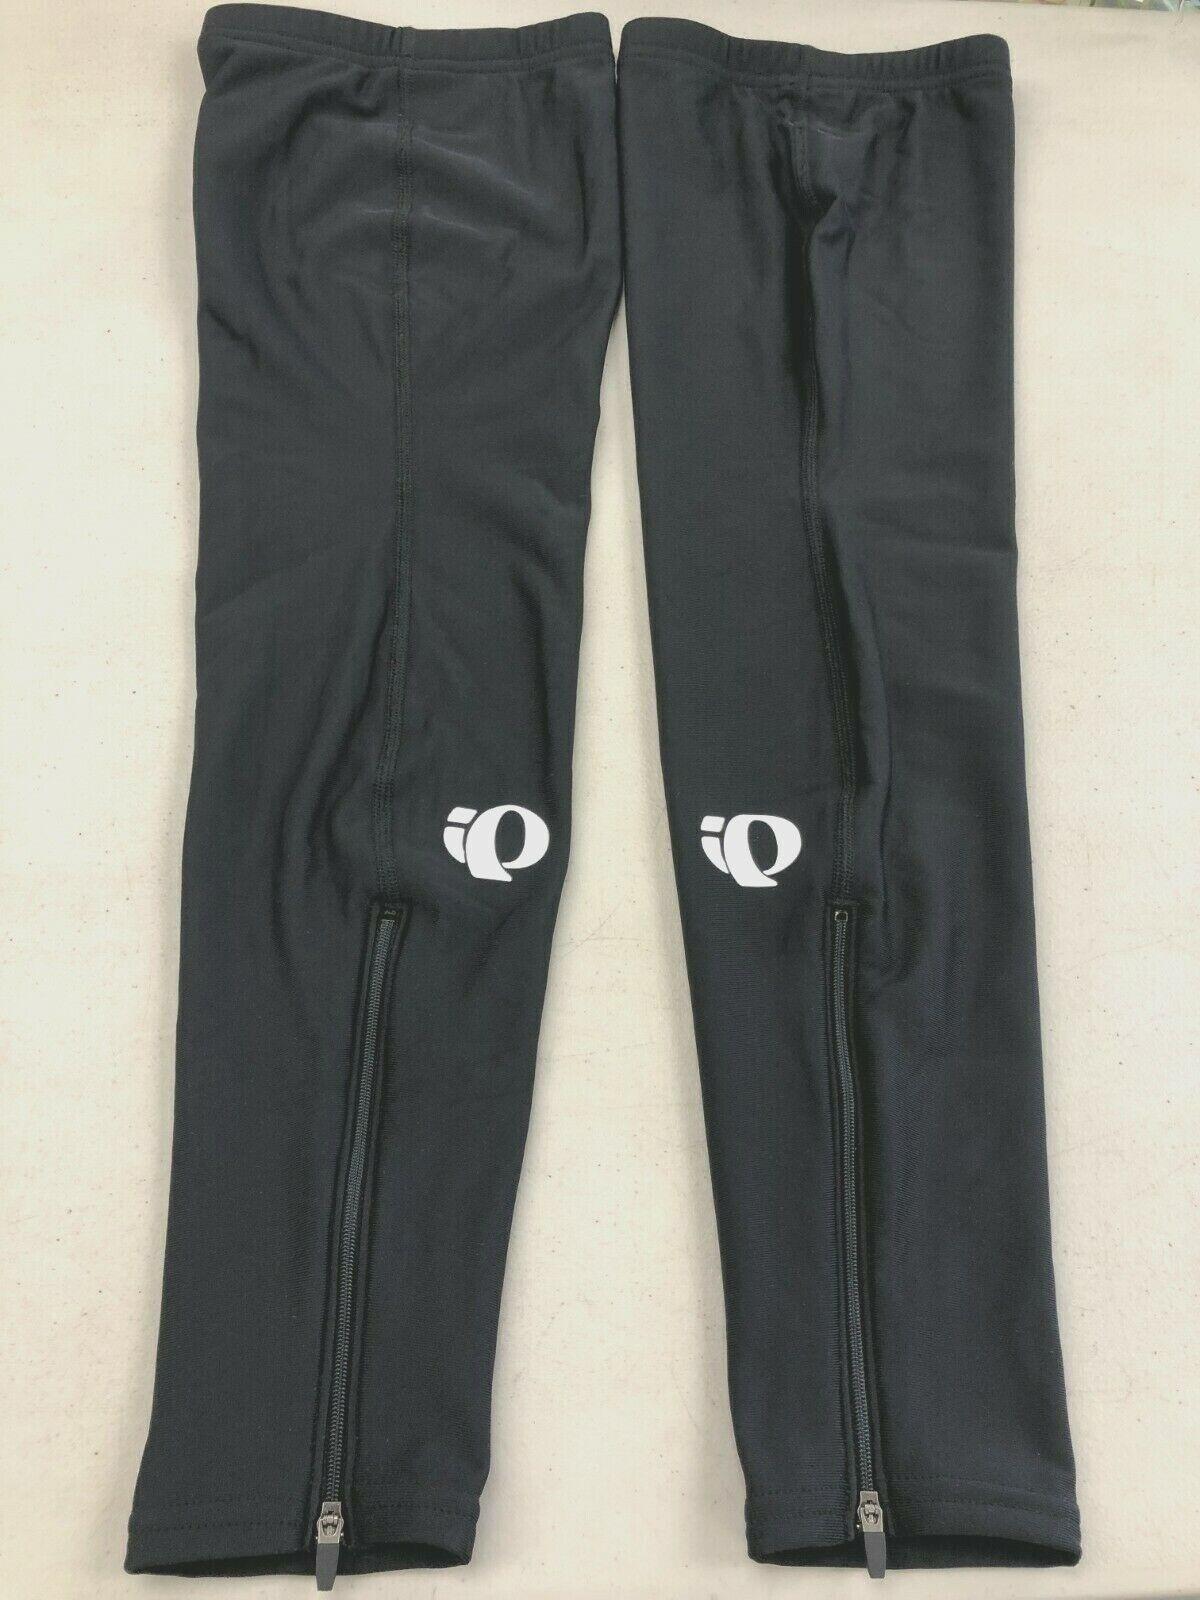 Pearl Izume Fleece Leg Warmers Unisex Large - $28.99